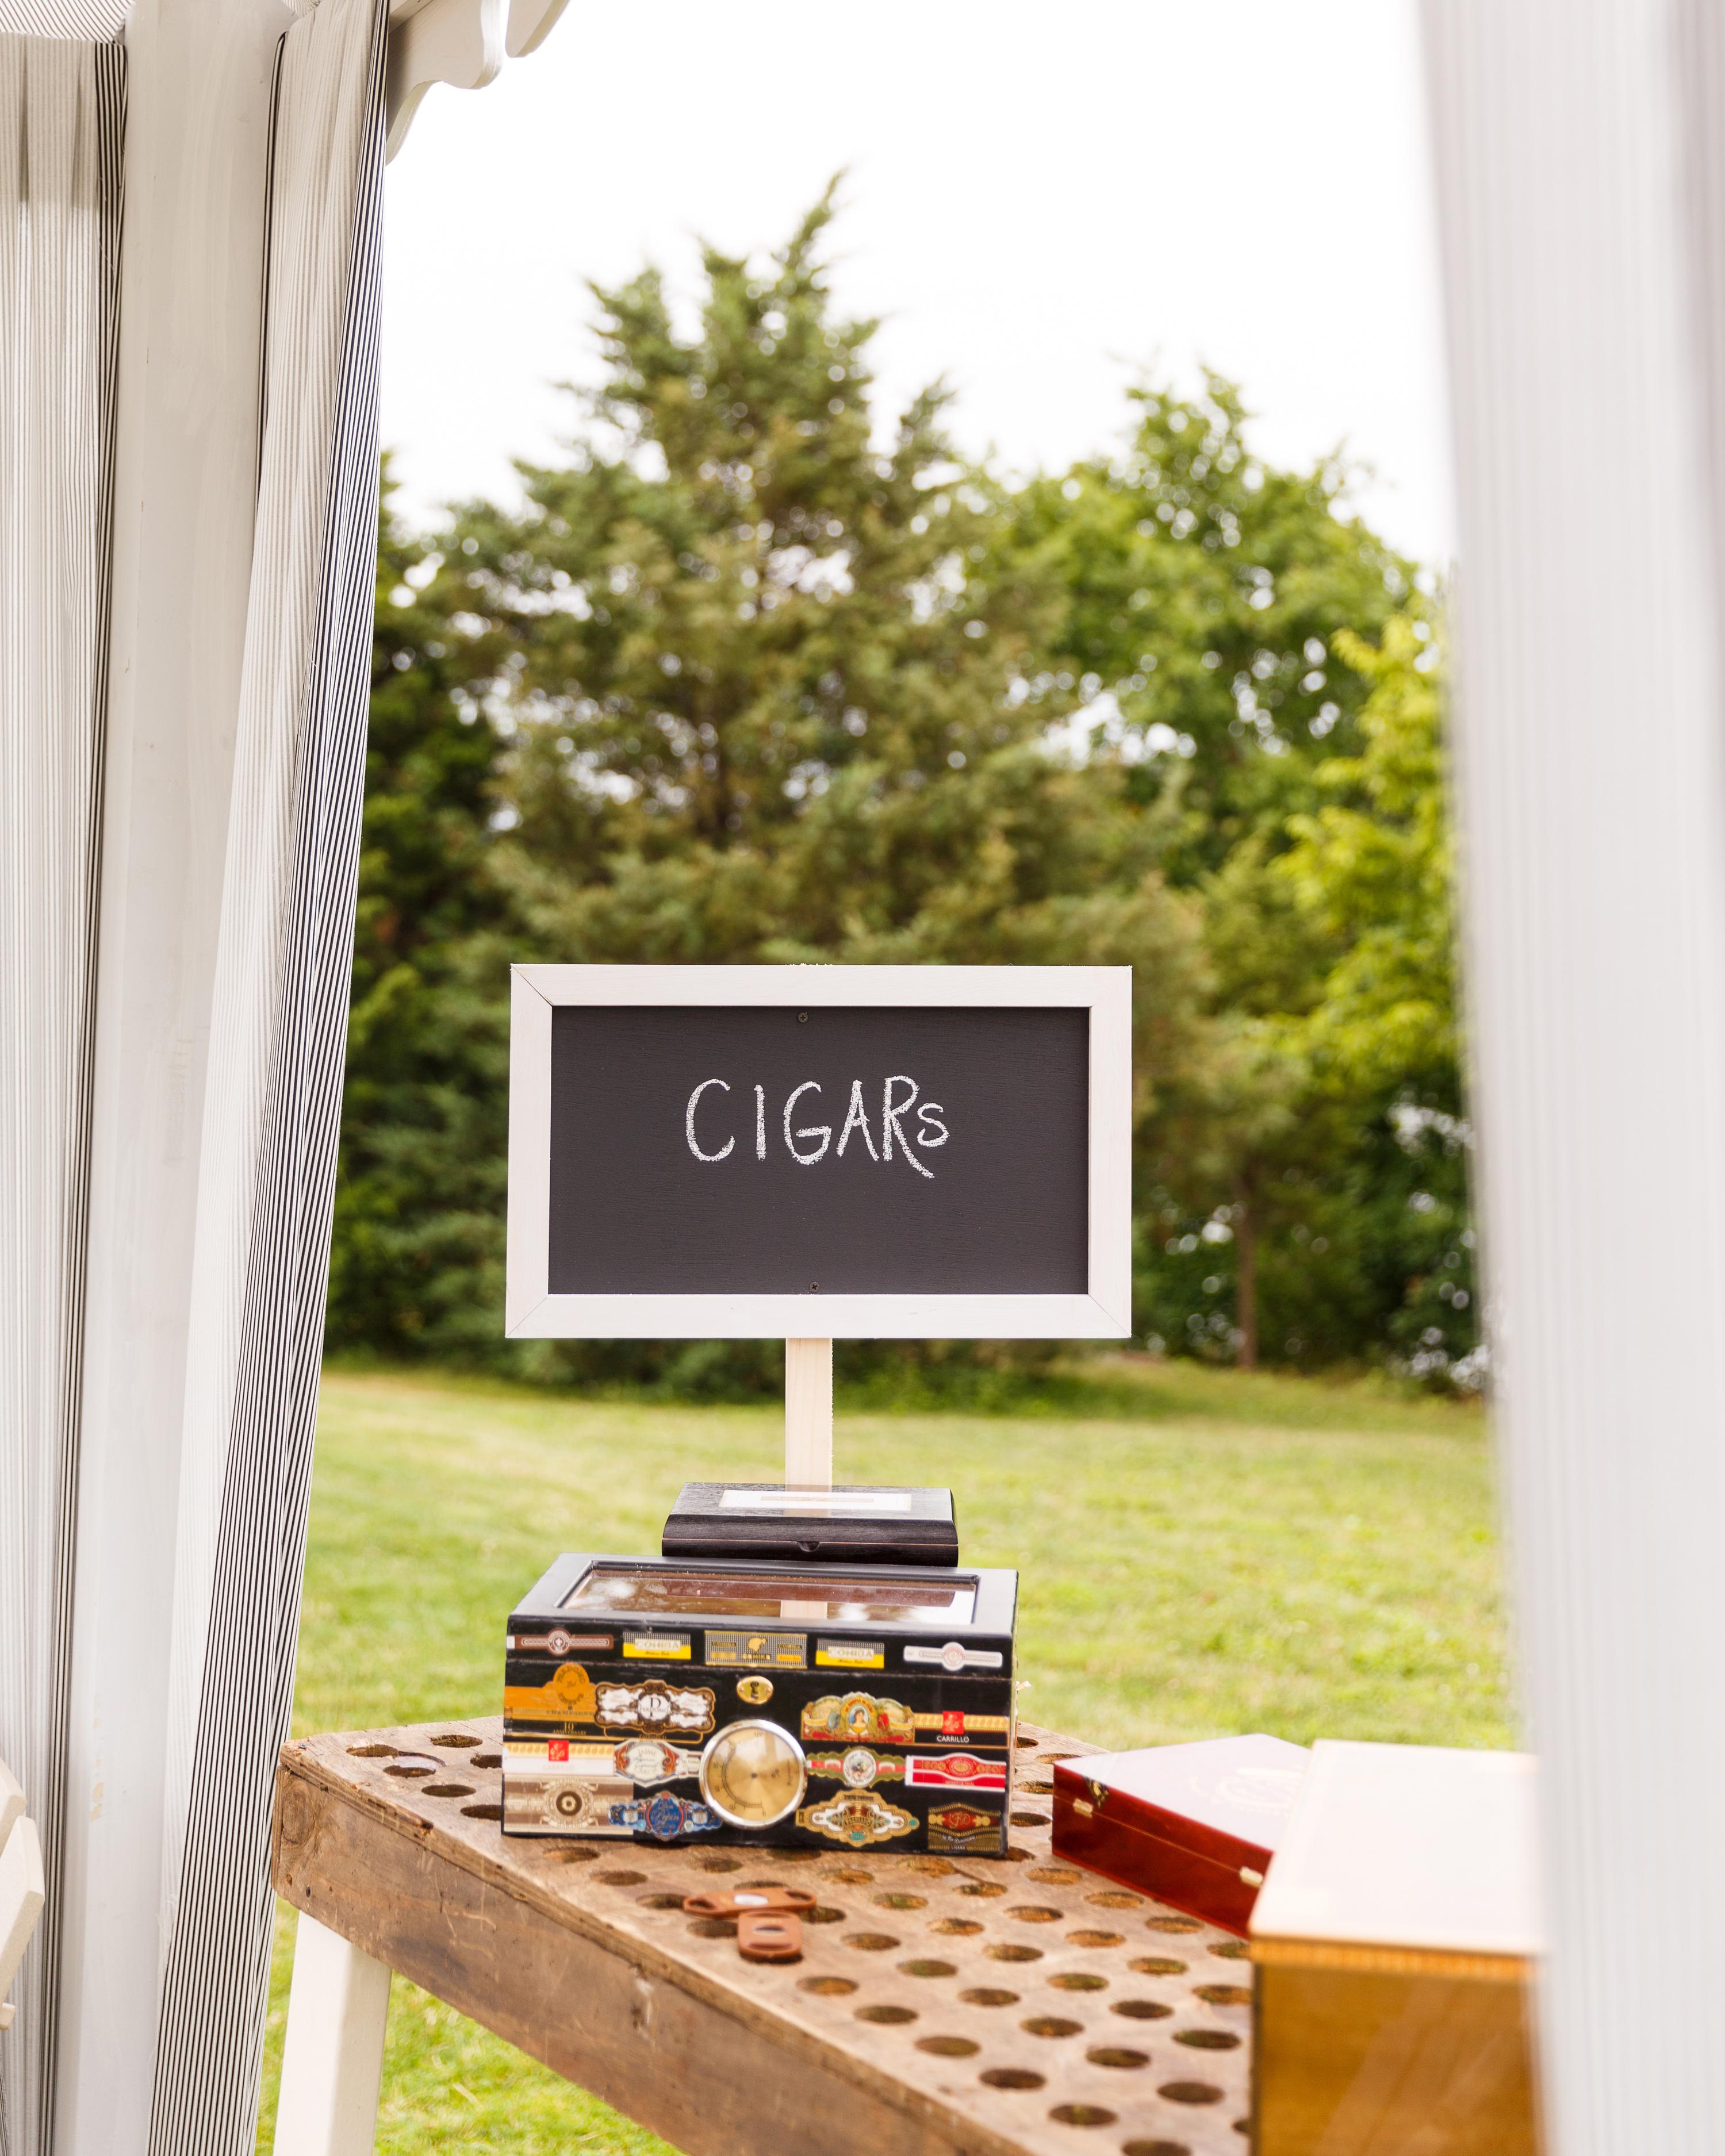 kristel-austin-wedding-cigars-0893-s11860-0415.jpg